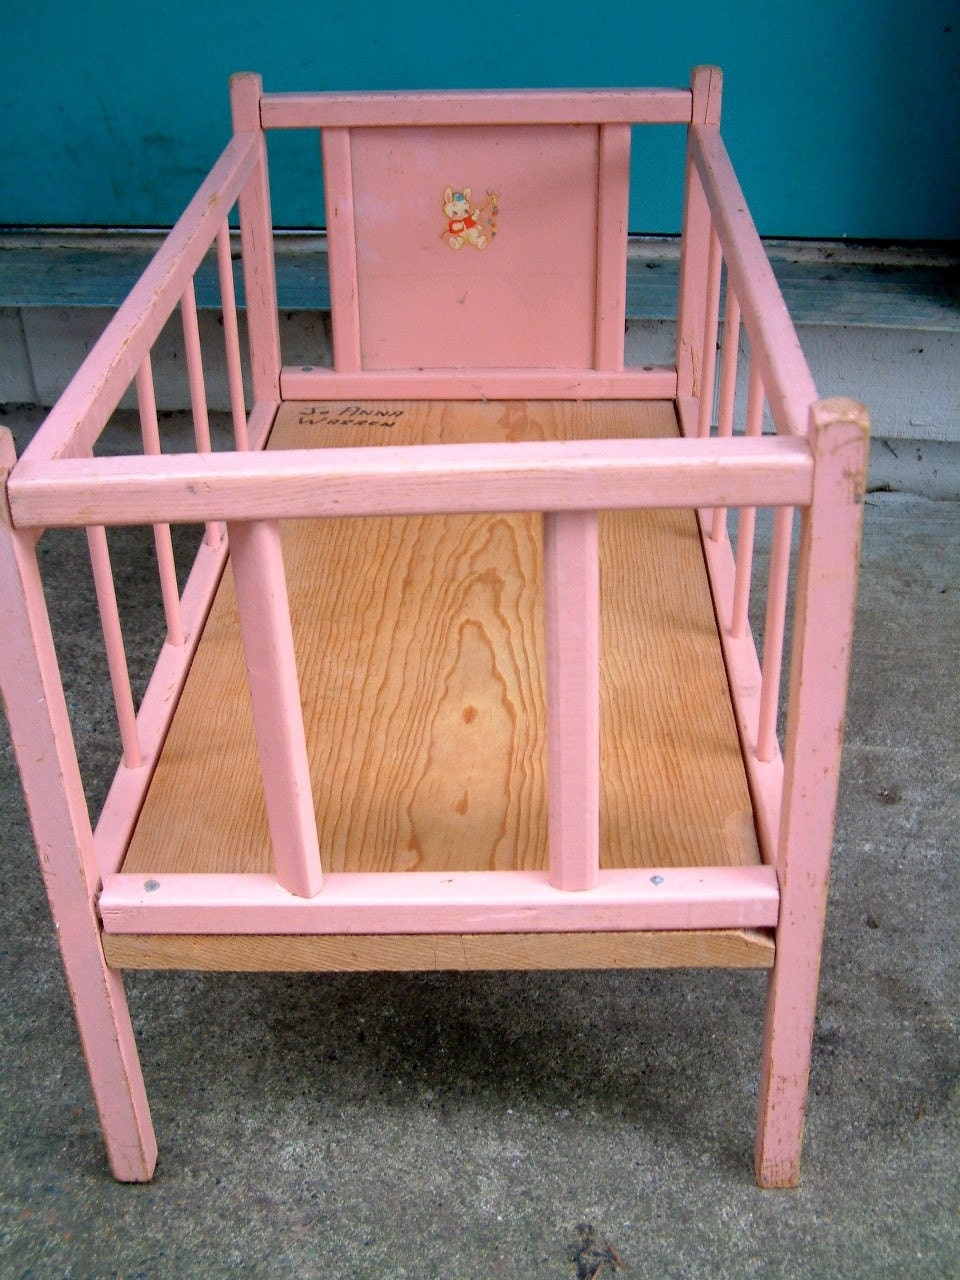 Wooden Pen Stand Designs : Vintage pink wooden doll crib